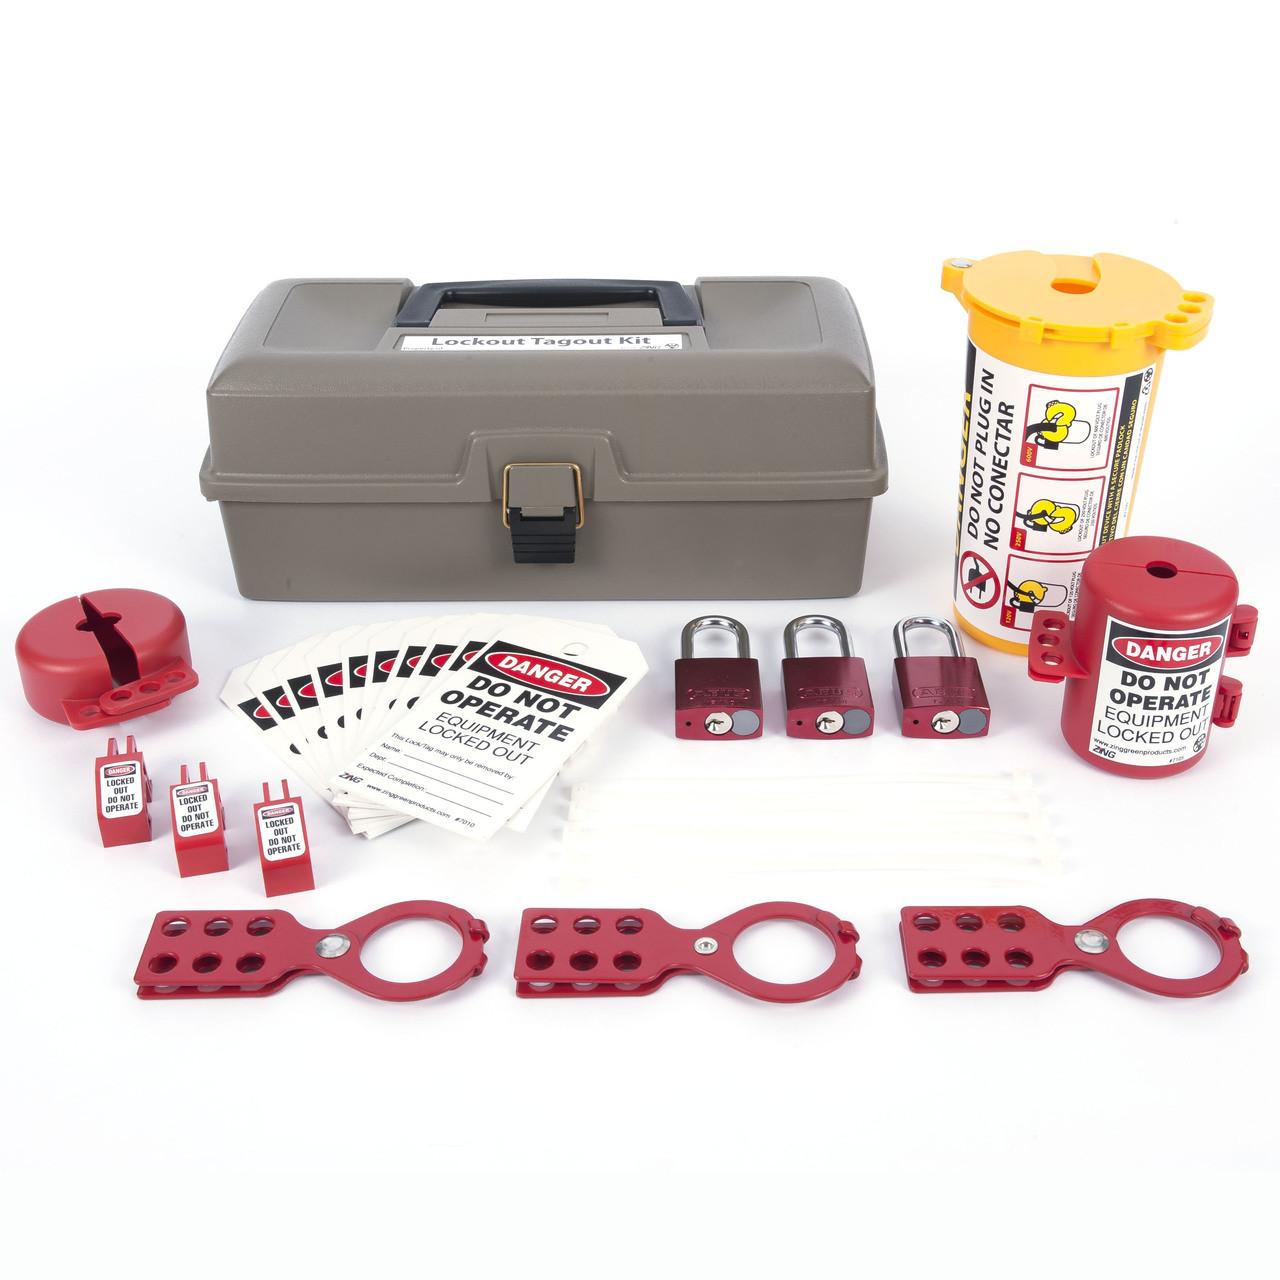 Lockout Tagout Box, 32 Component